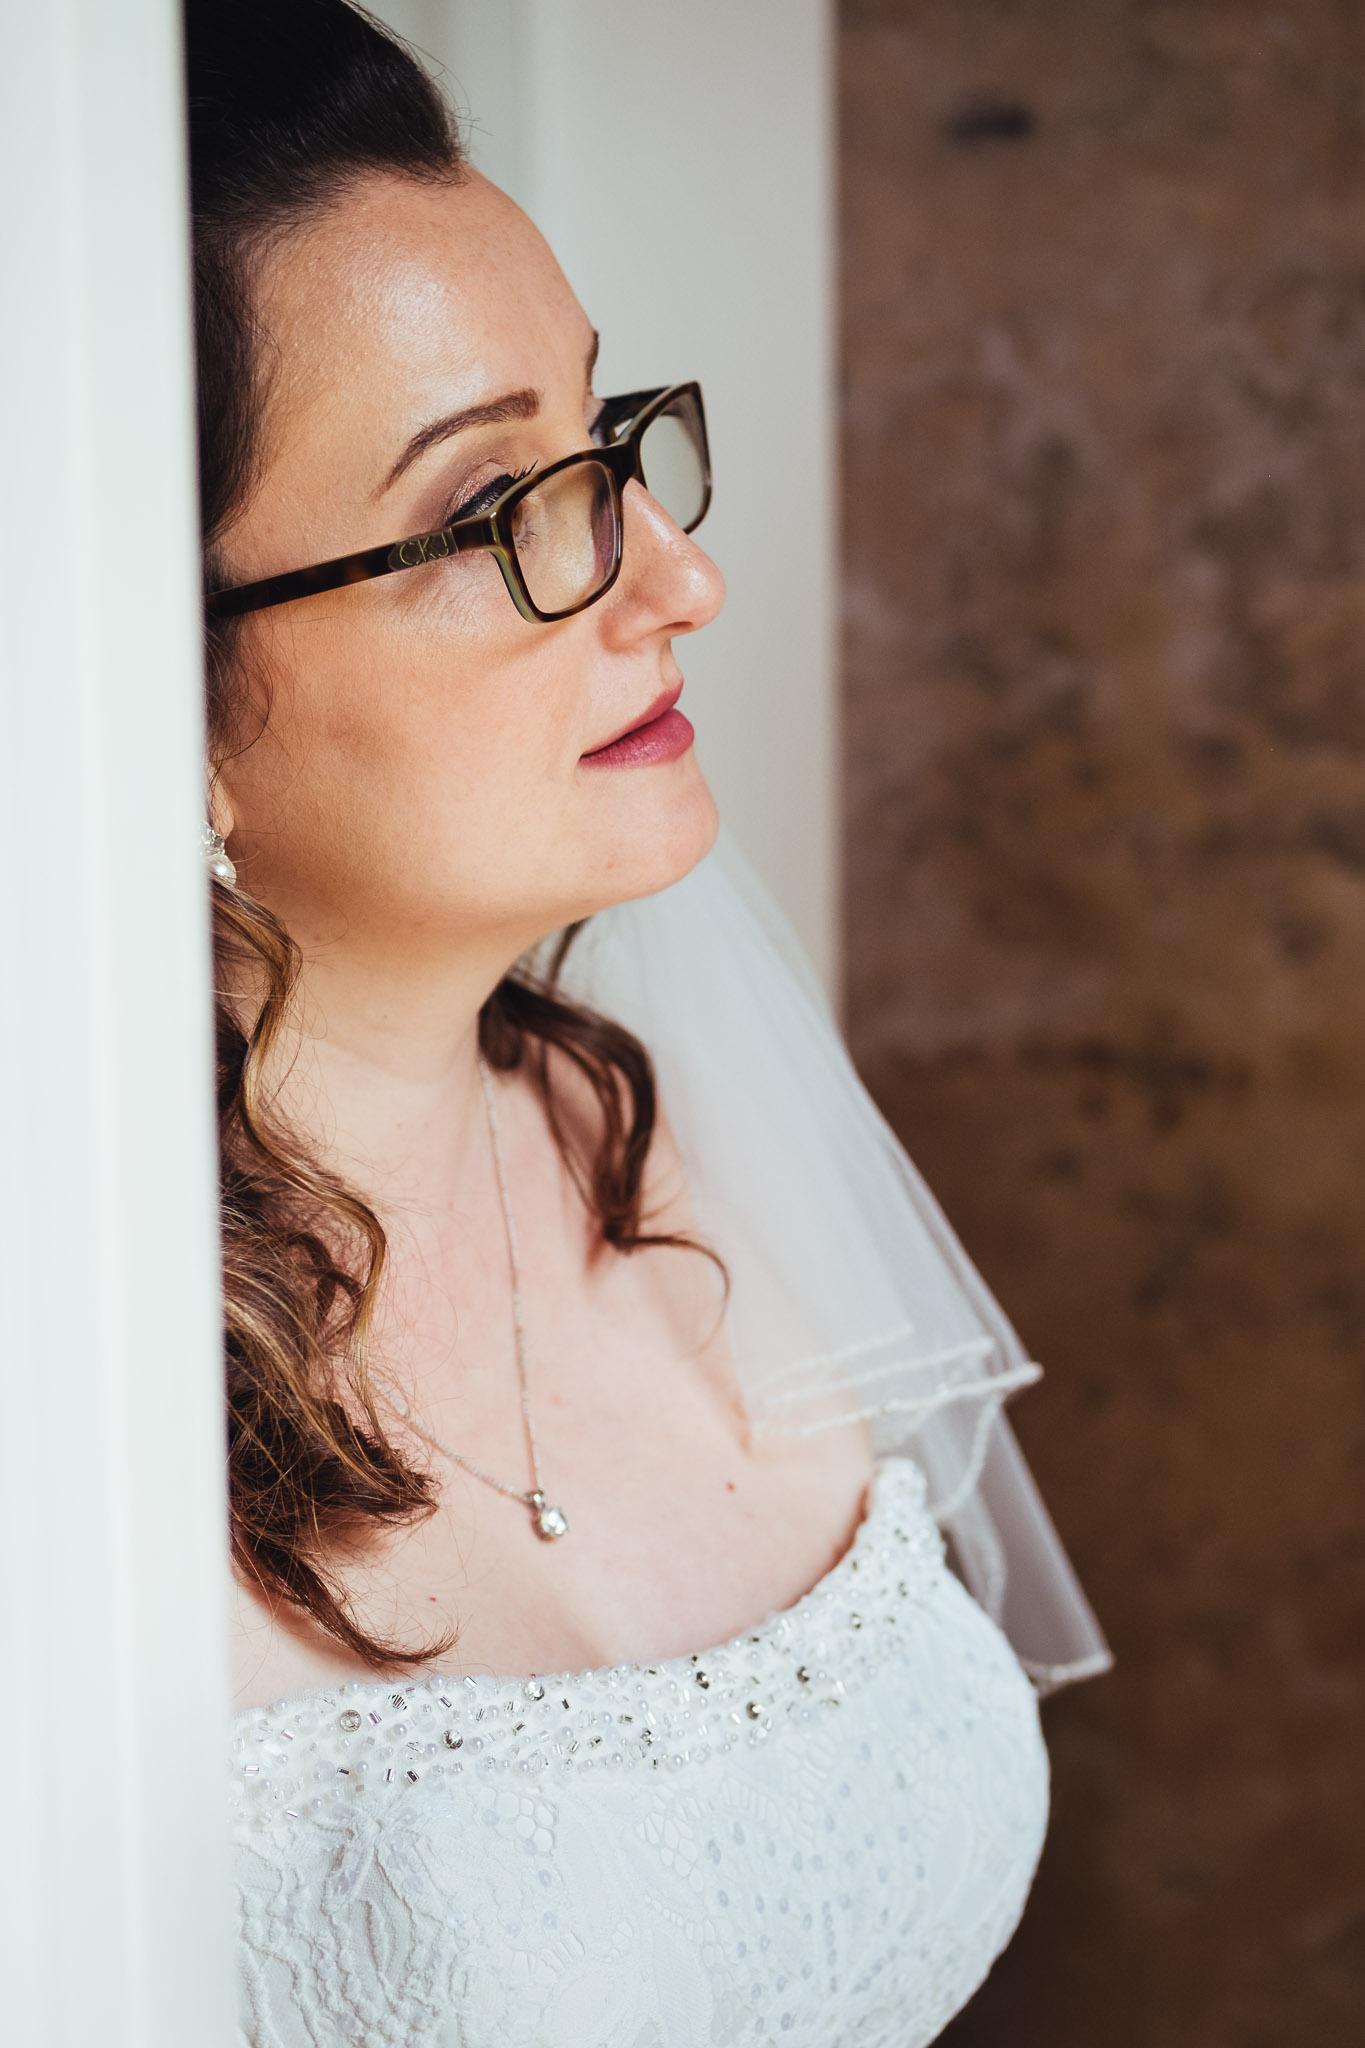 bruiloft op landgoed westerlee in groningen met dilek en tim portret bruid